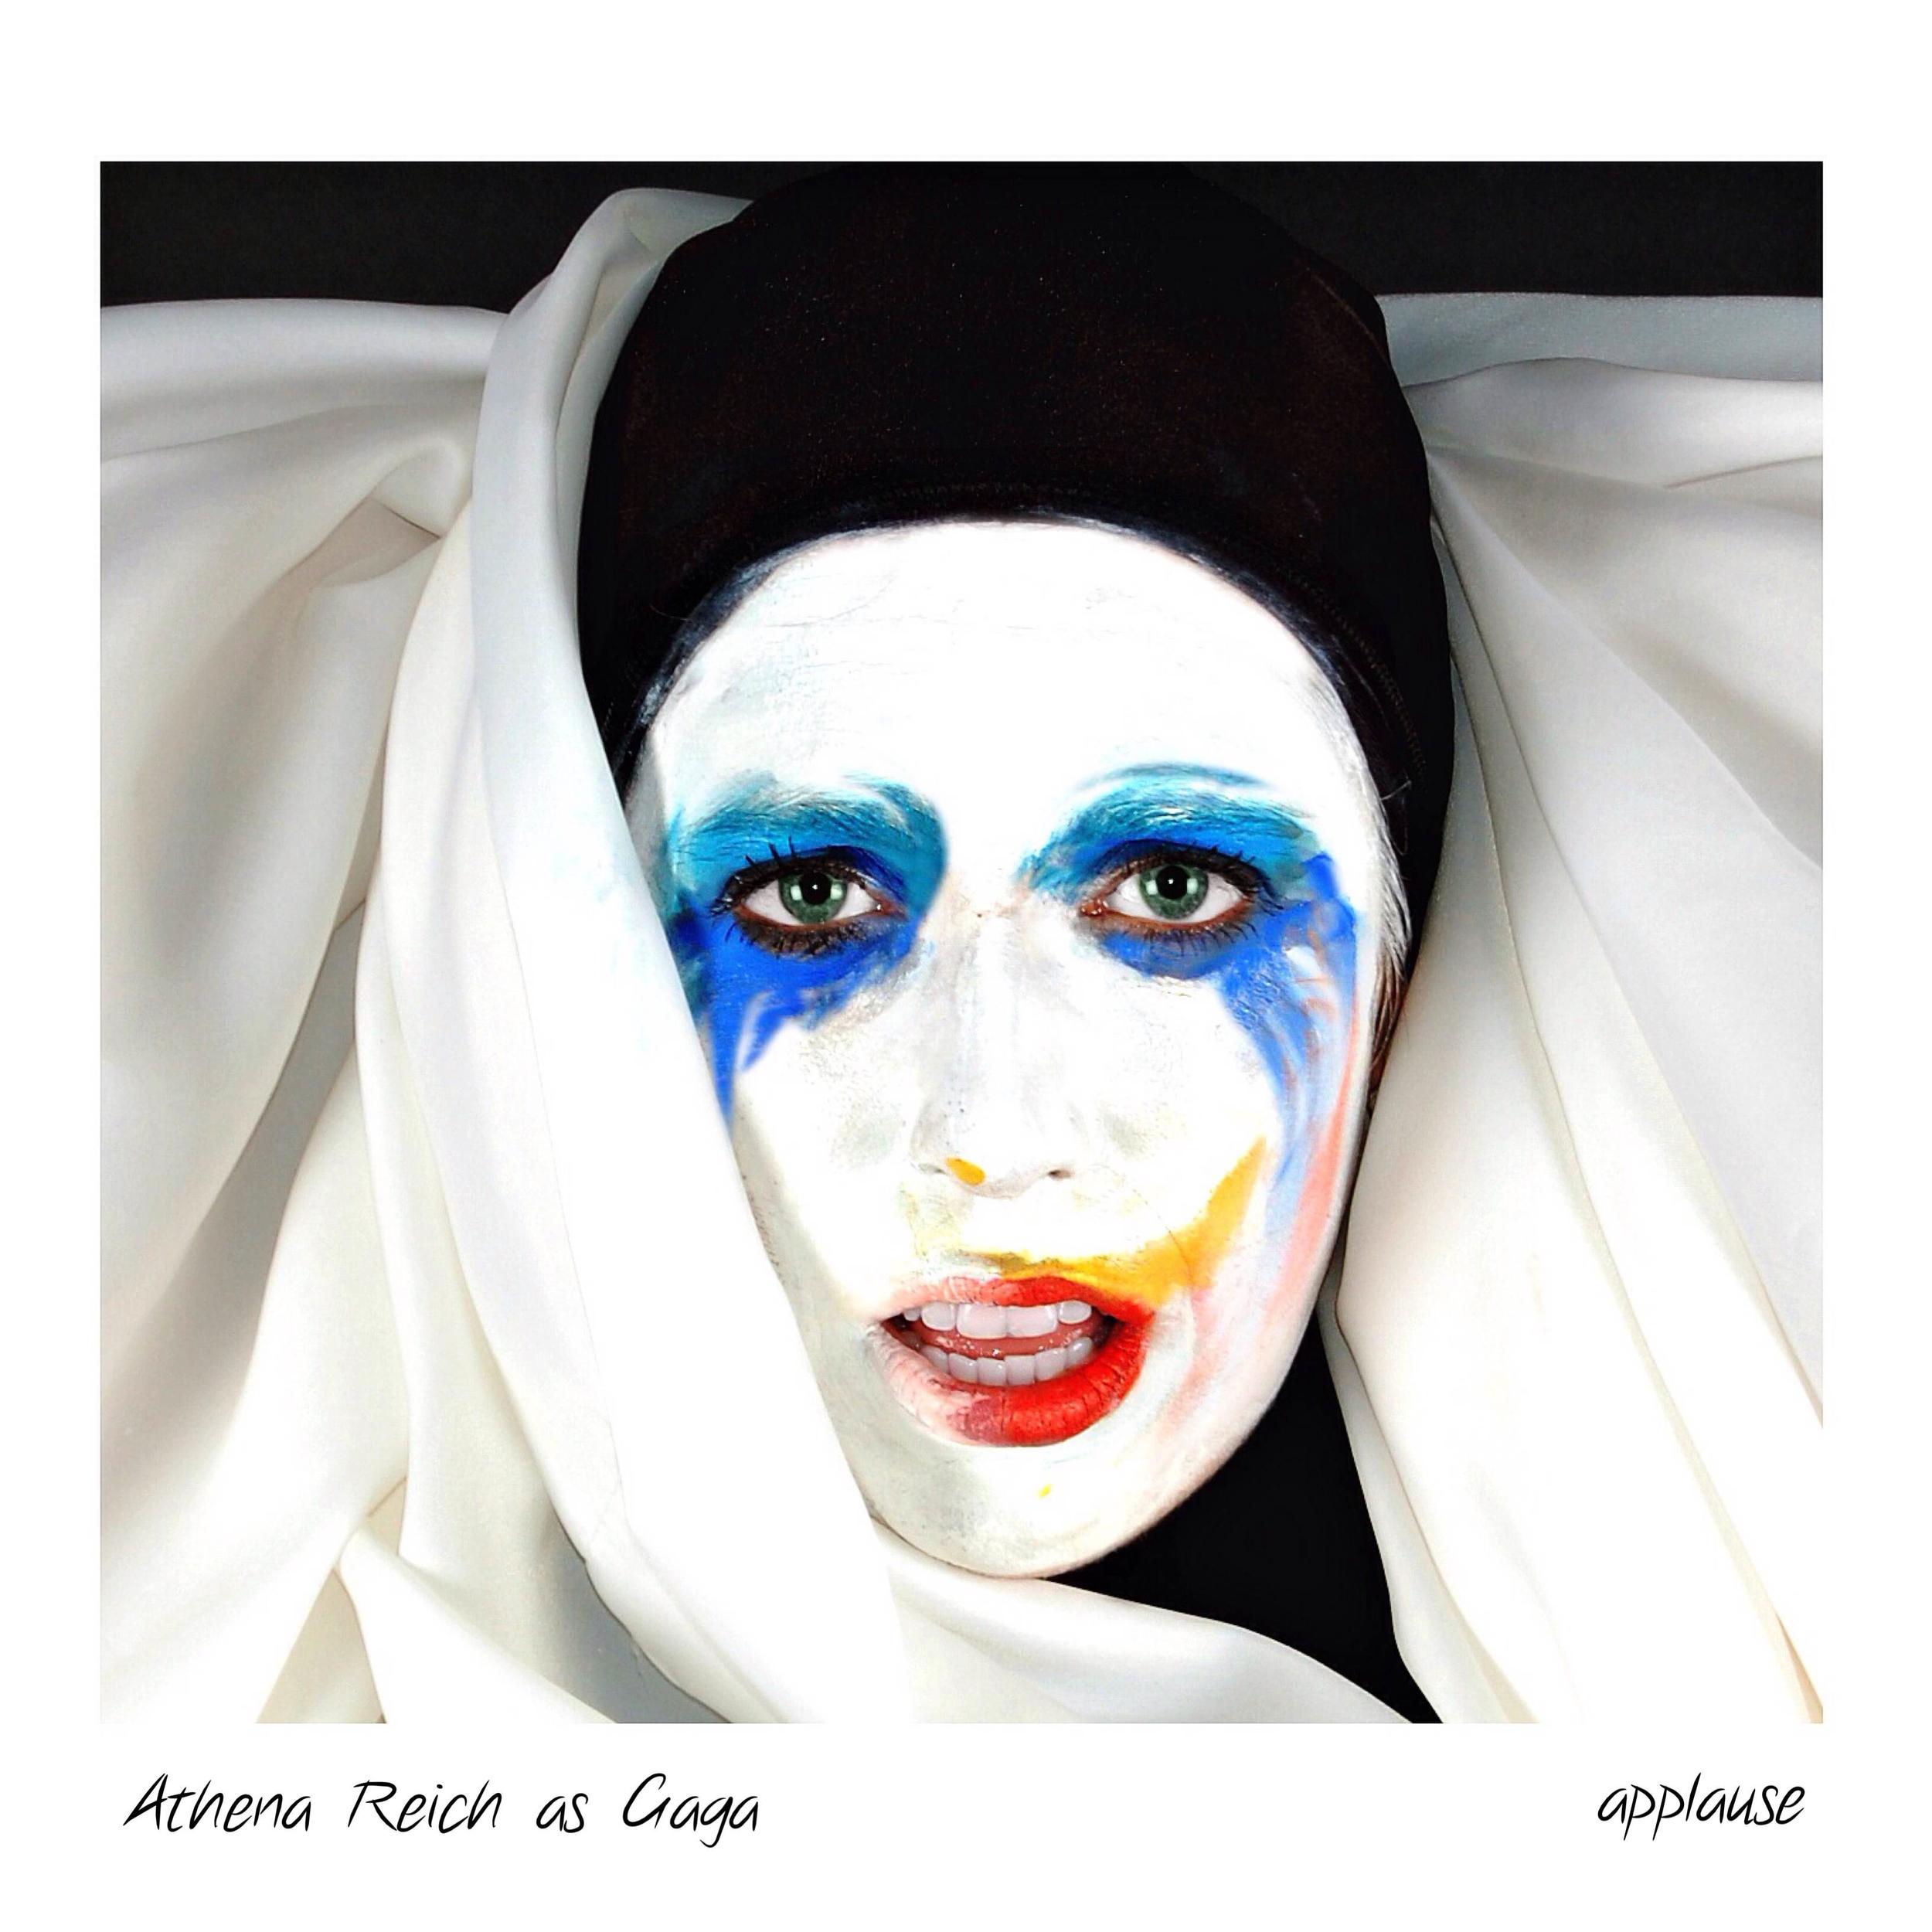 Athena as Gaga in Artpop